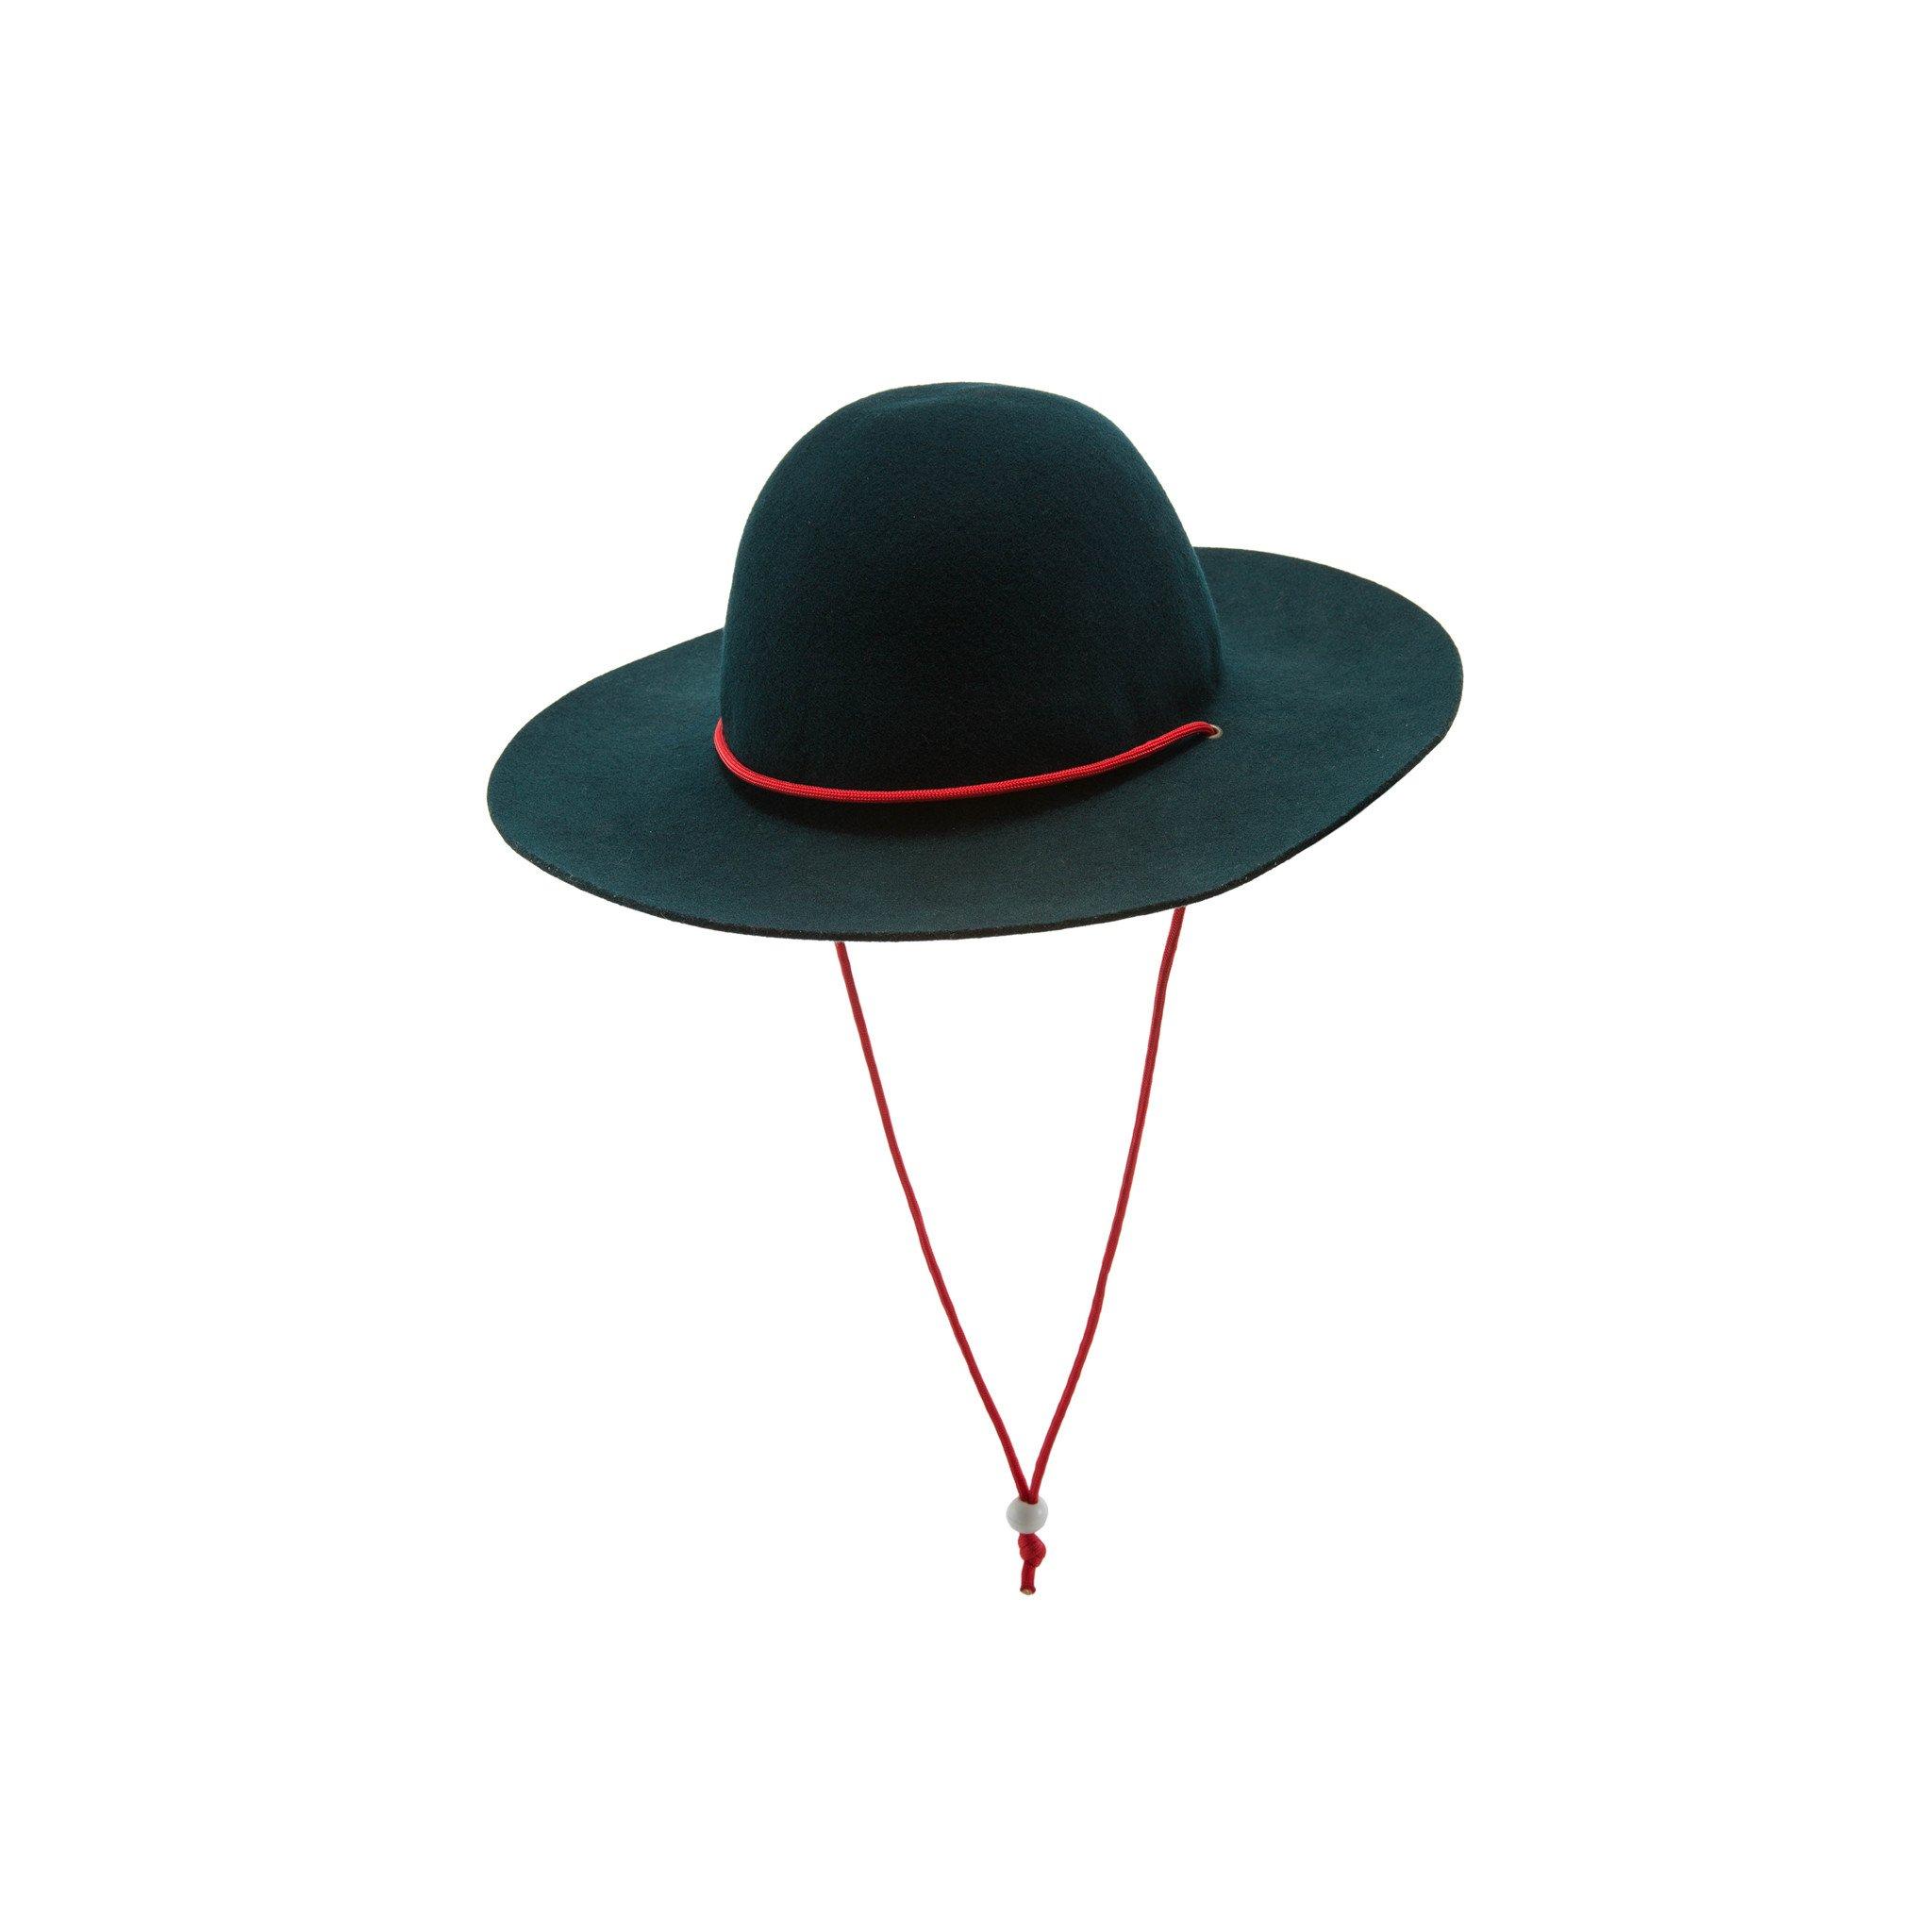 apparel-topo-designs-x-westerlind-hat-1_2048x2048.jpg